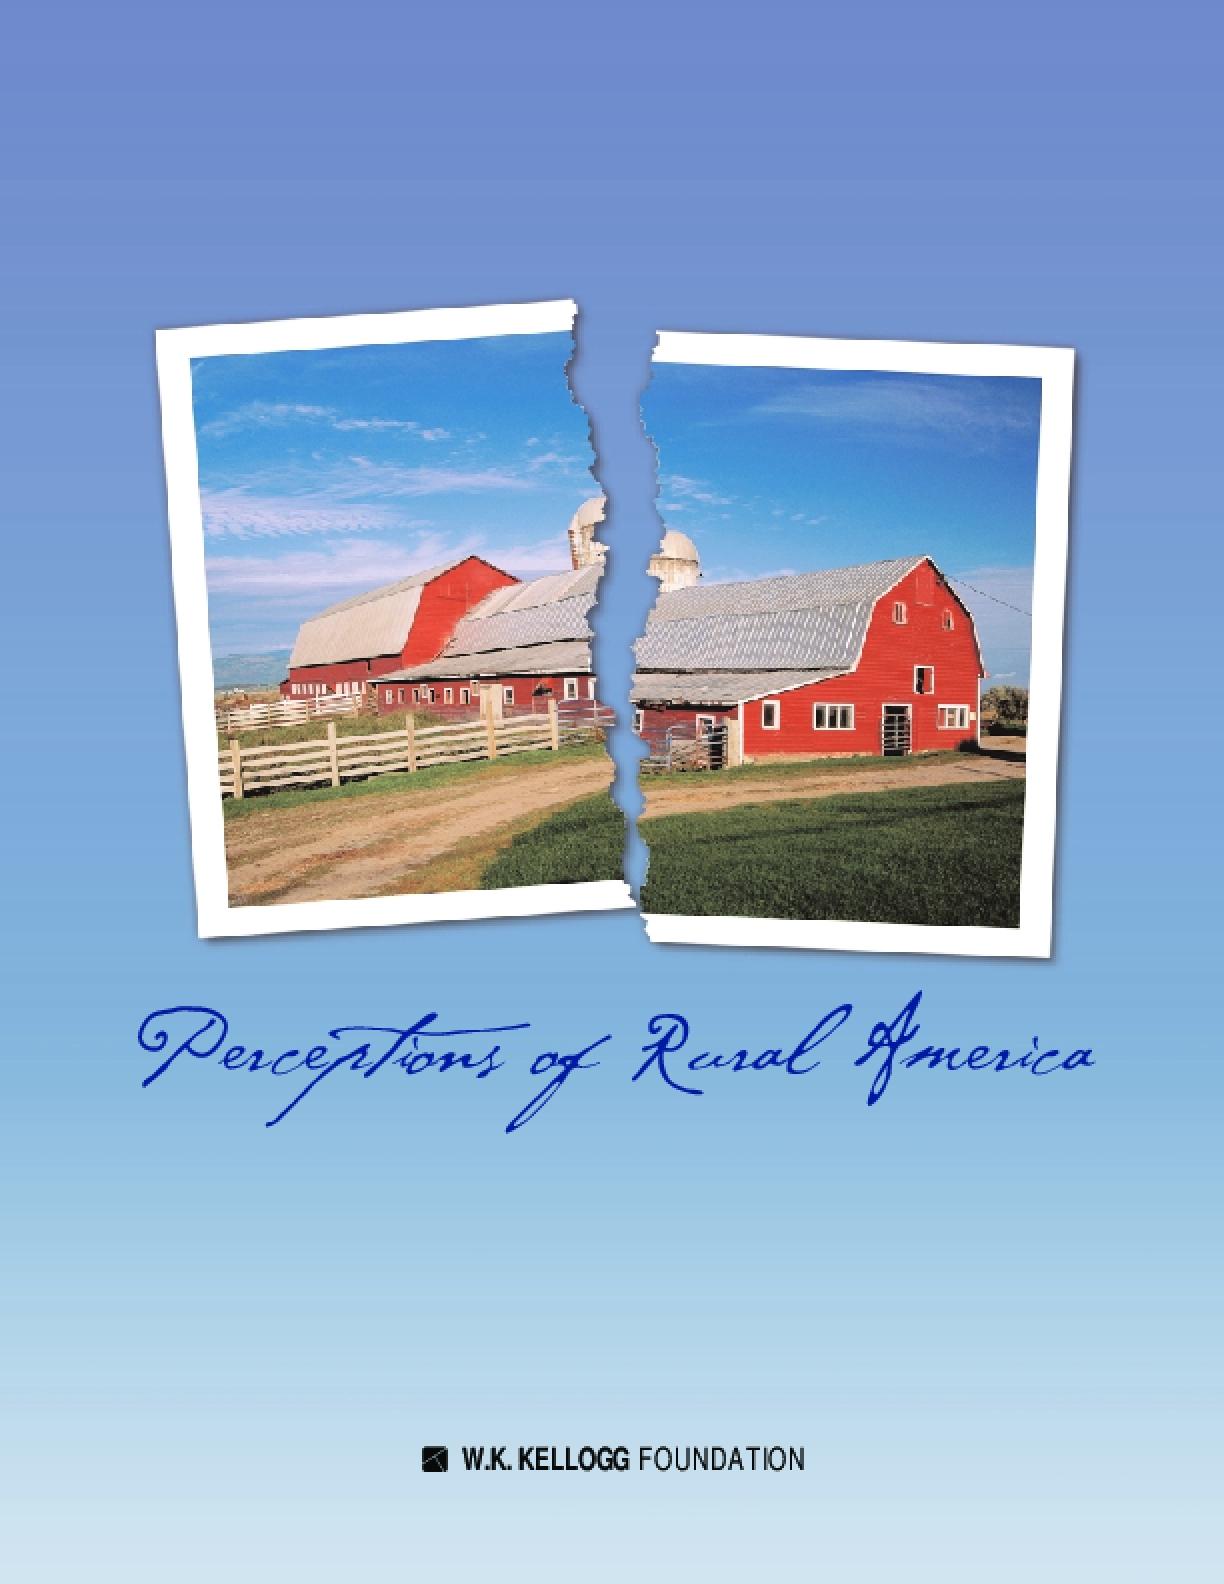 Perceptions of Rural America